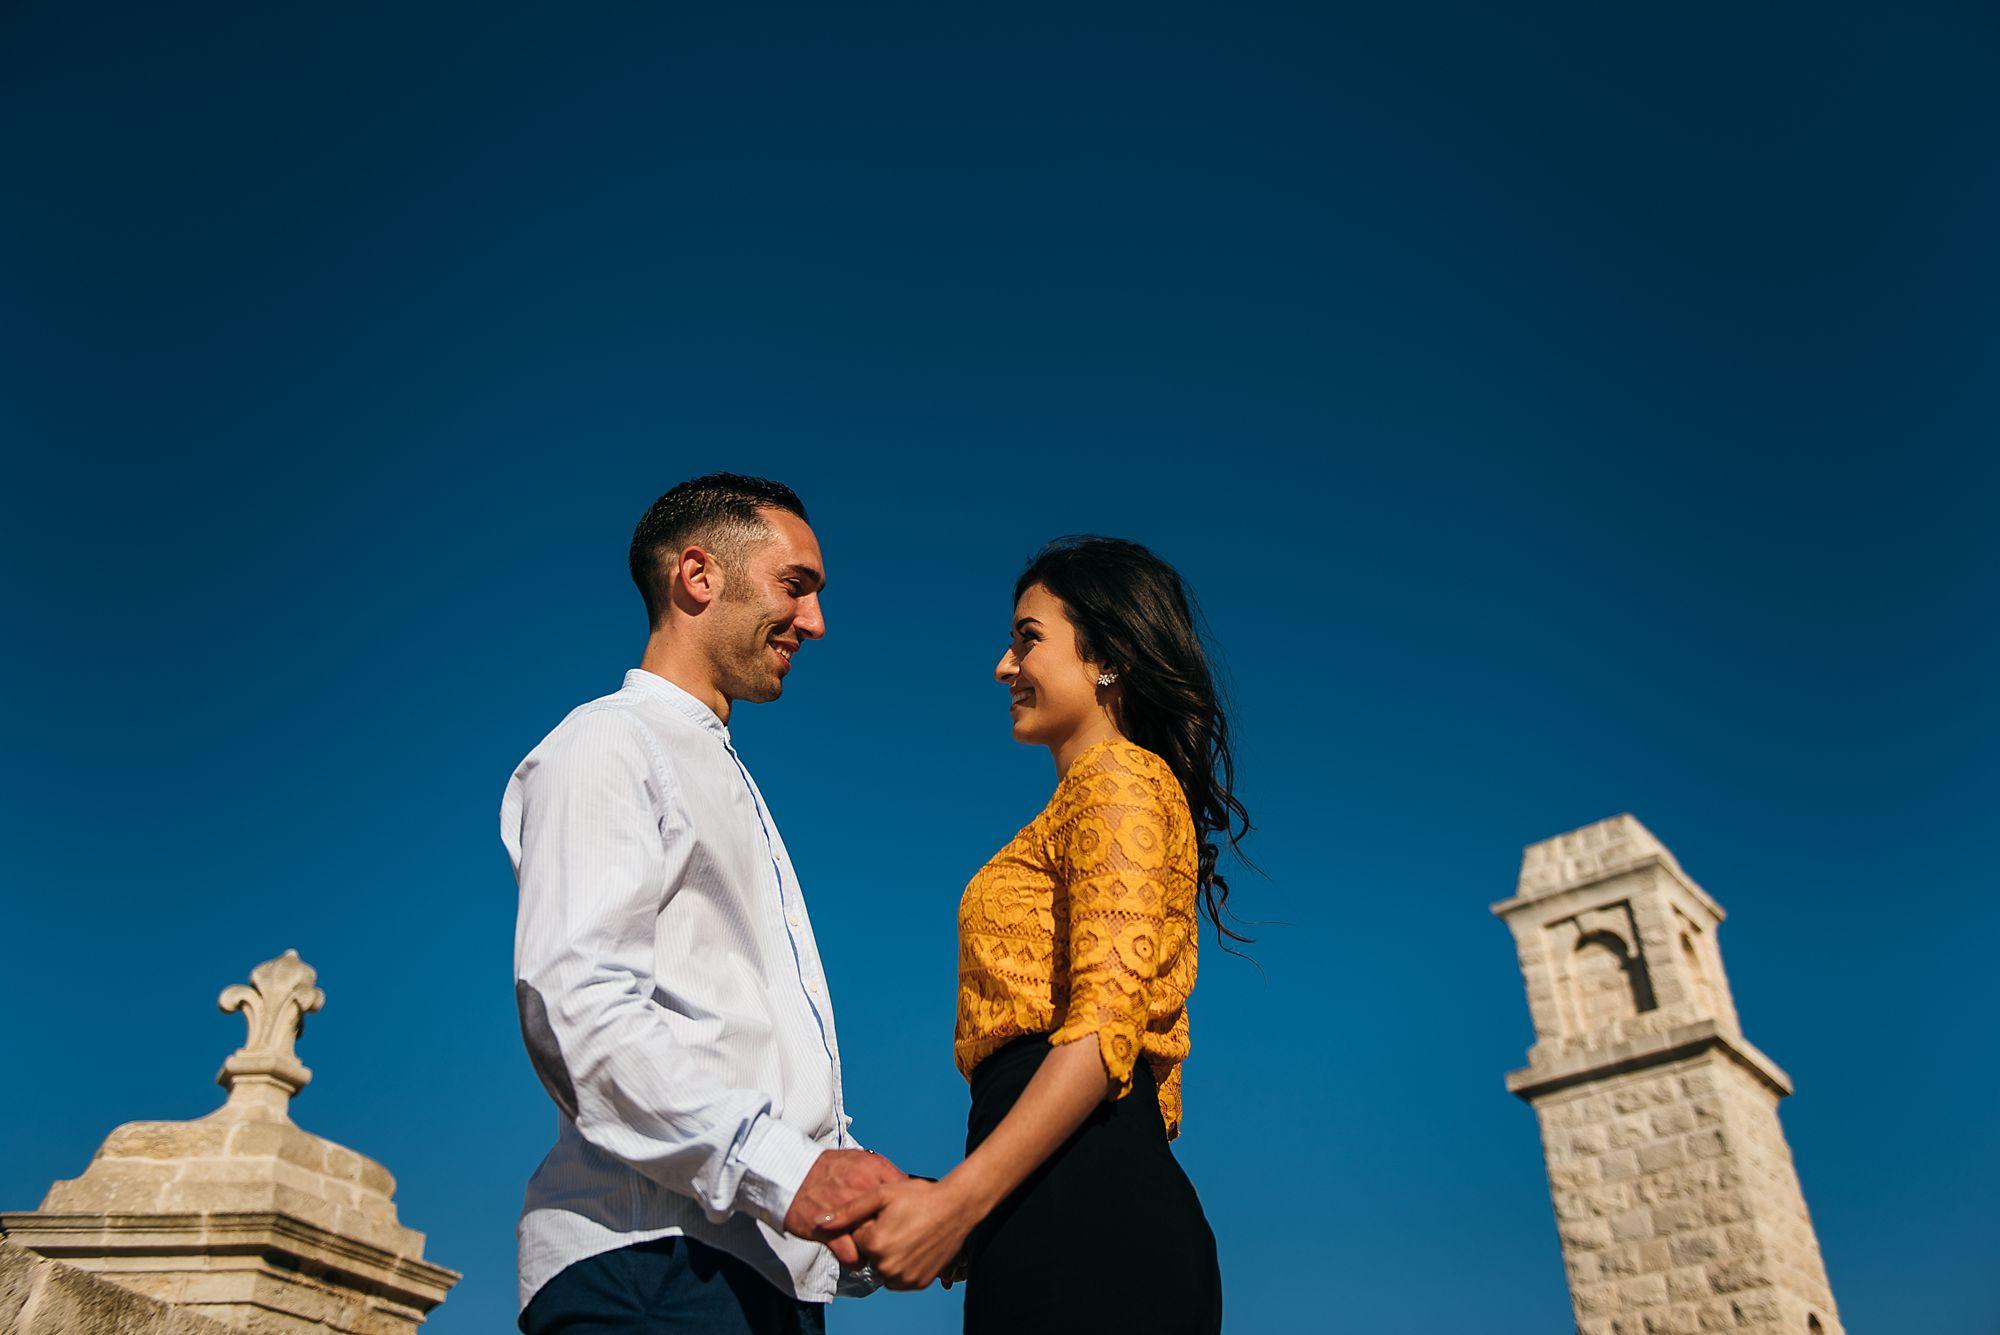 Thea & Philip - Pre Wedding Session - Malta - Shane P. Watts Photography